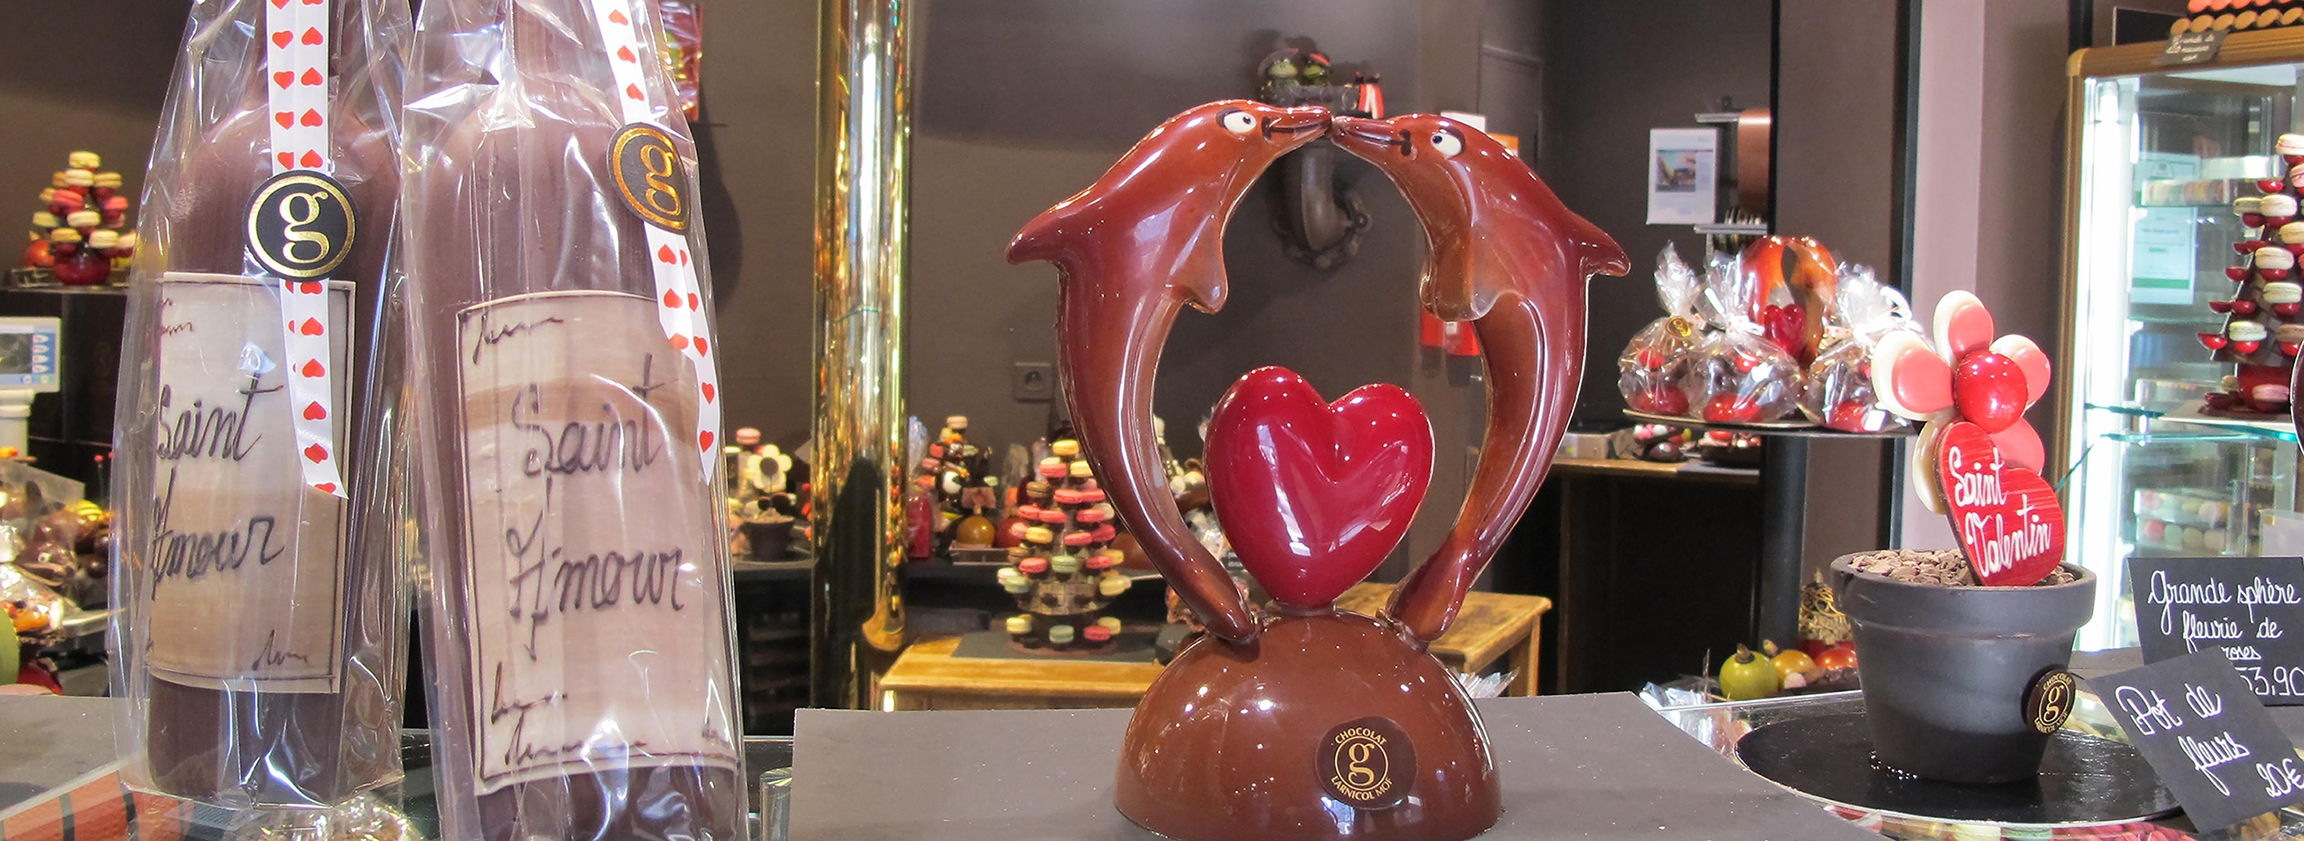 Gourmet activities in Paris for St Valentine's day